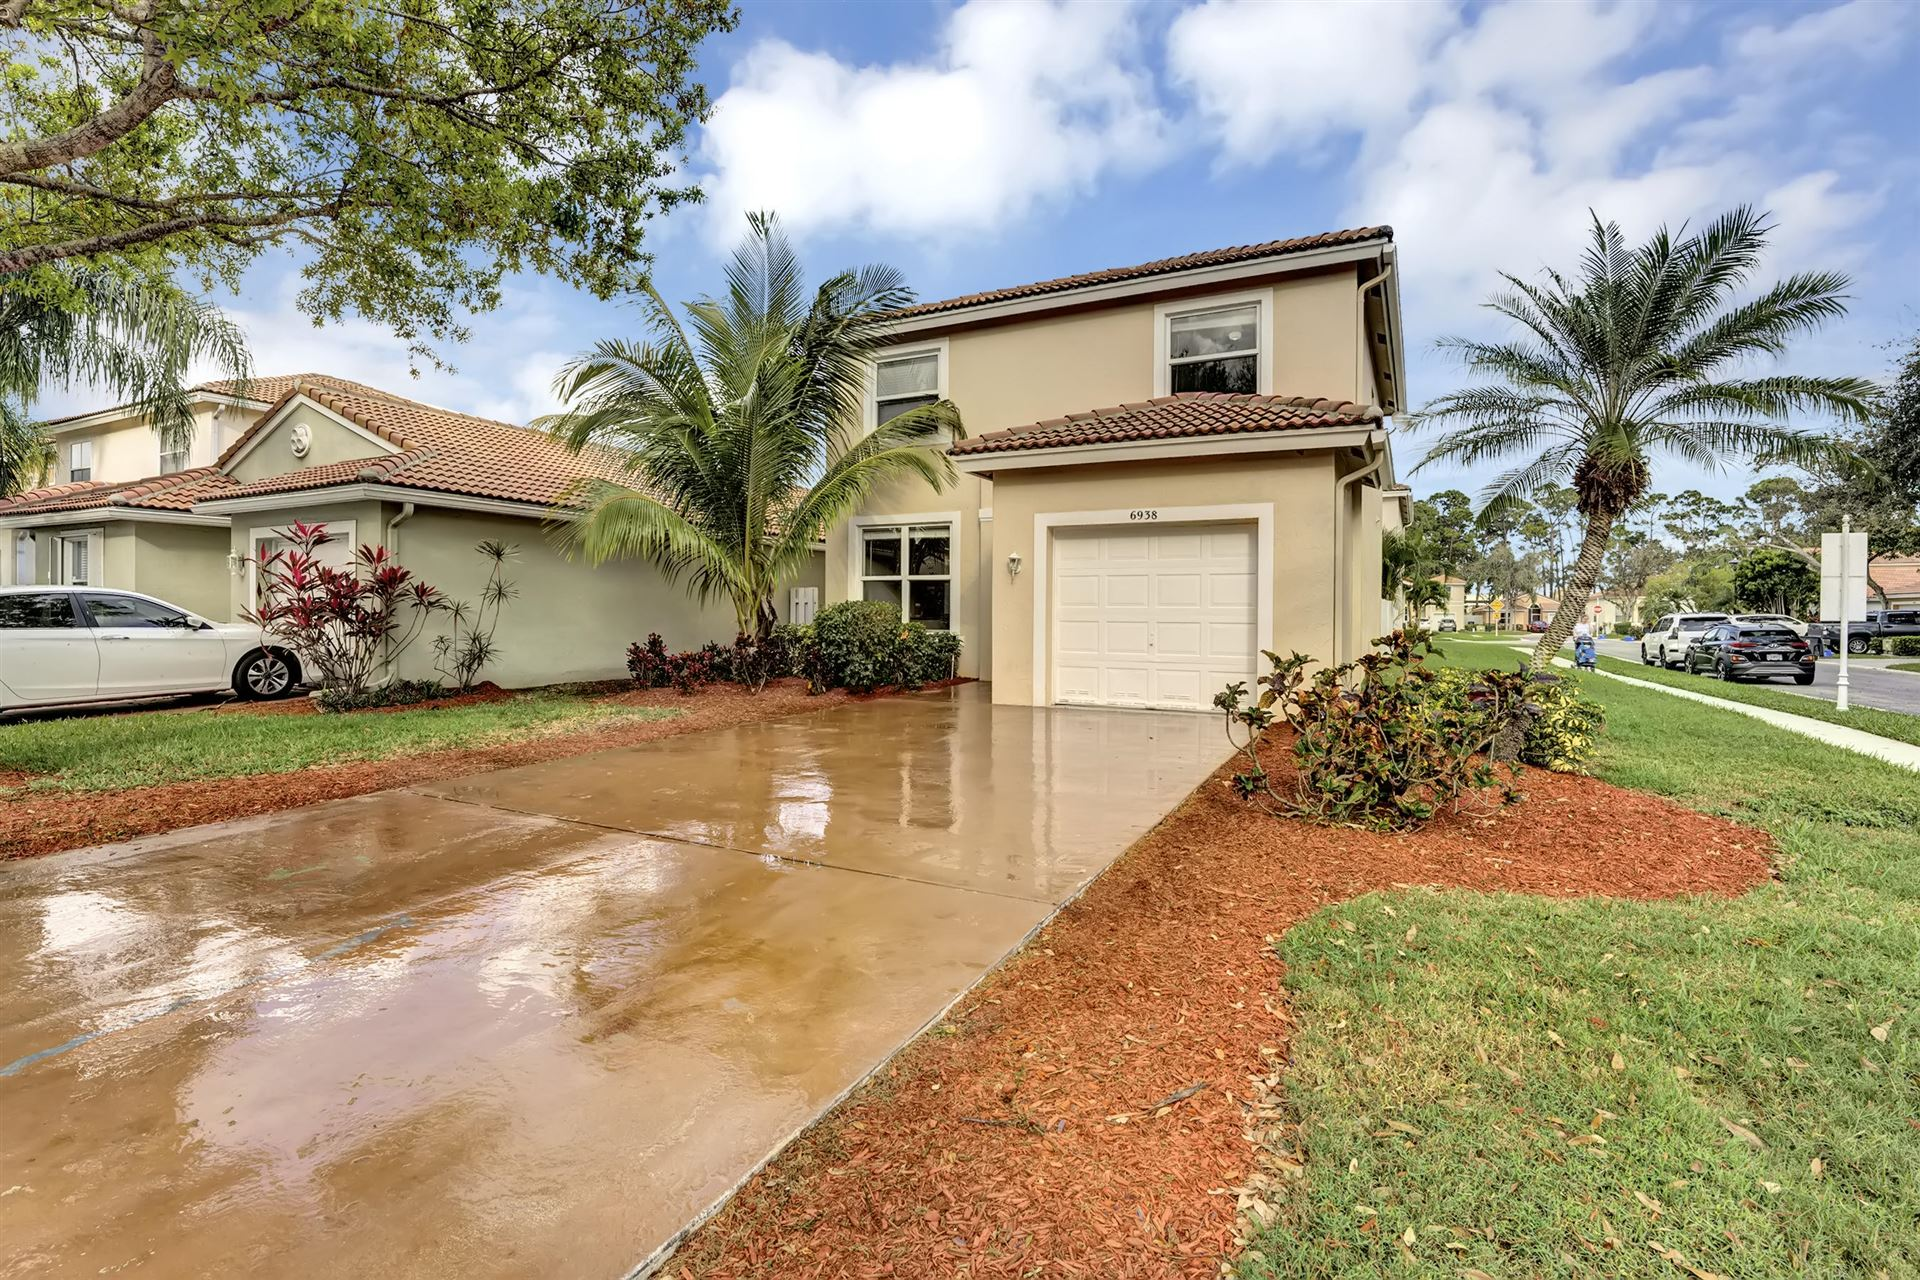 6938 Desert Inn Terrace, Lake Worth, FL 33463 - MLS#: RX-10712168